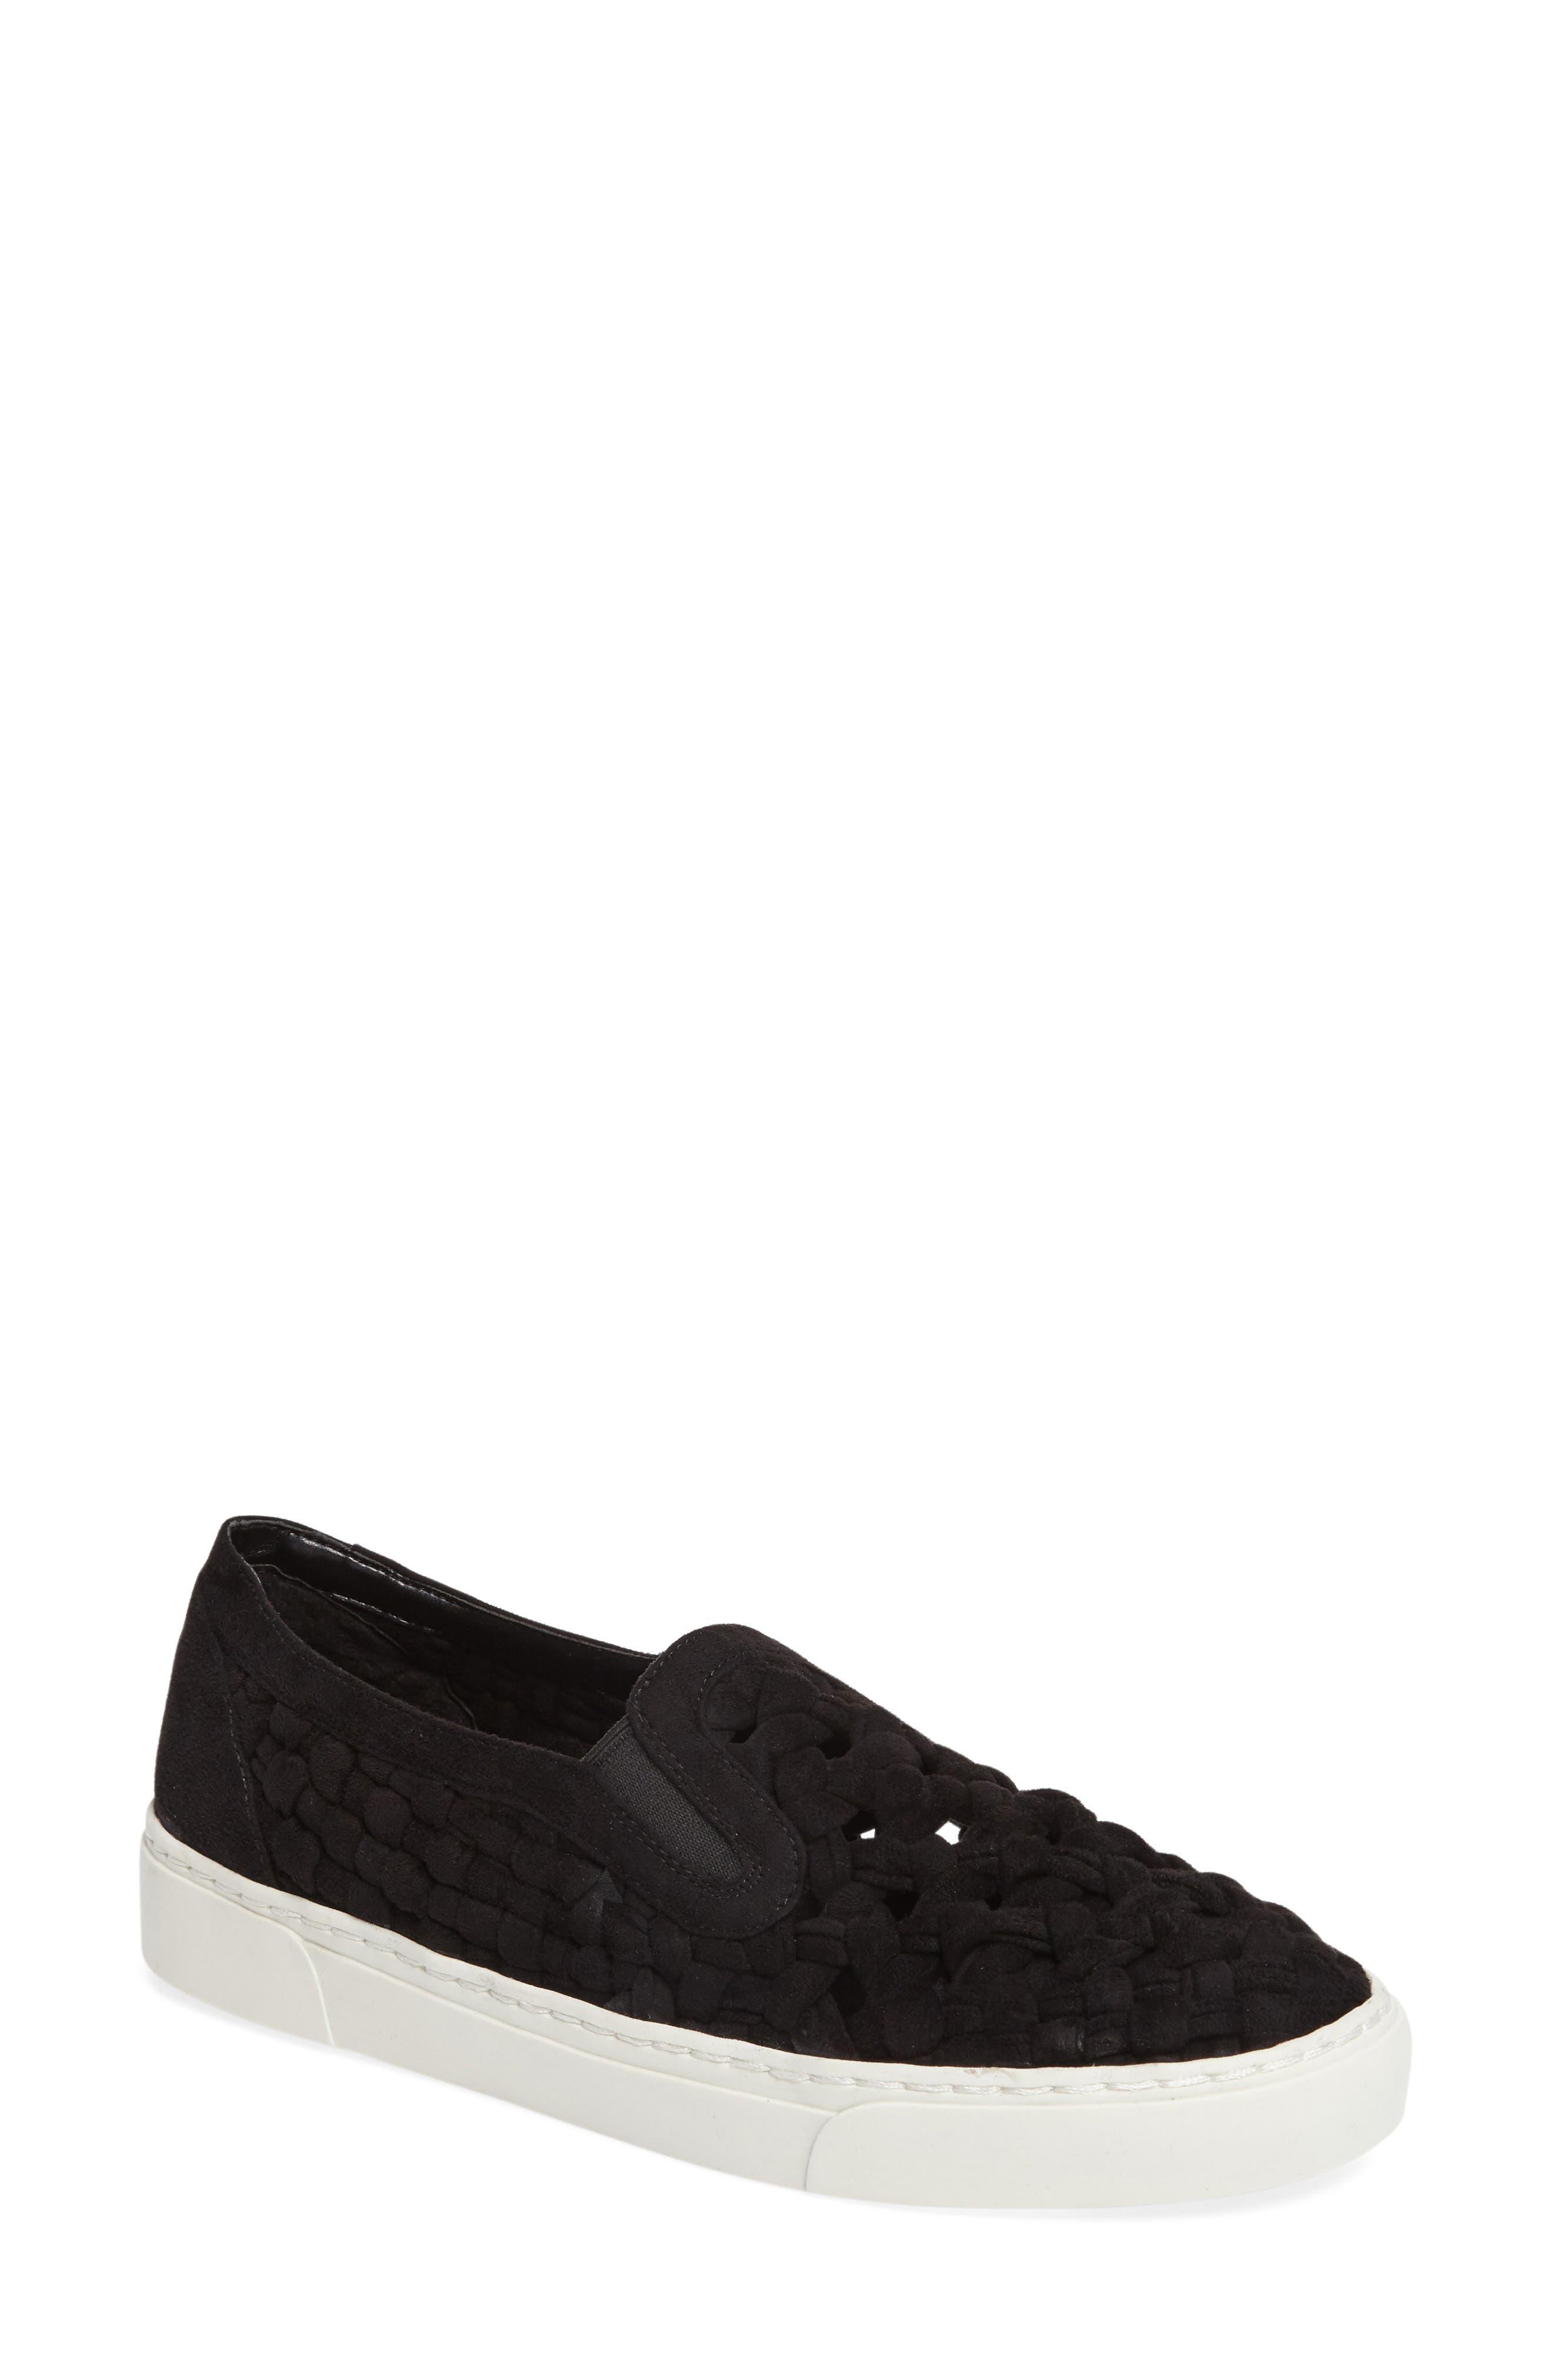 Delphin Braided Slip-On Sneaker,                         Main,                         color, 001